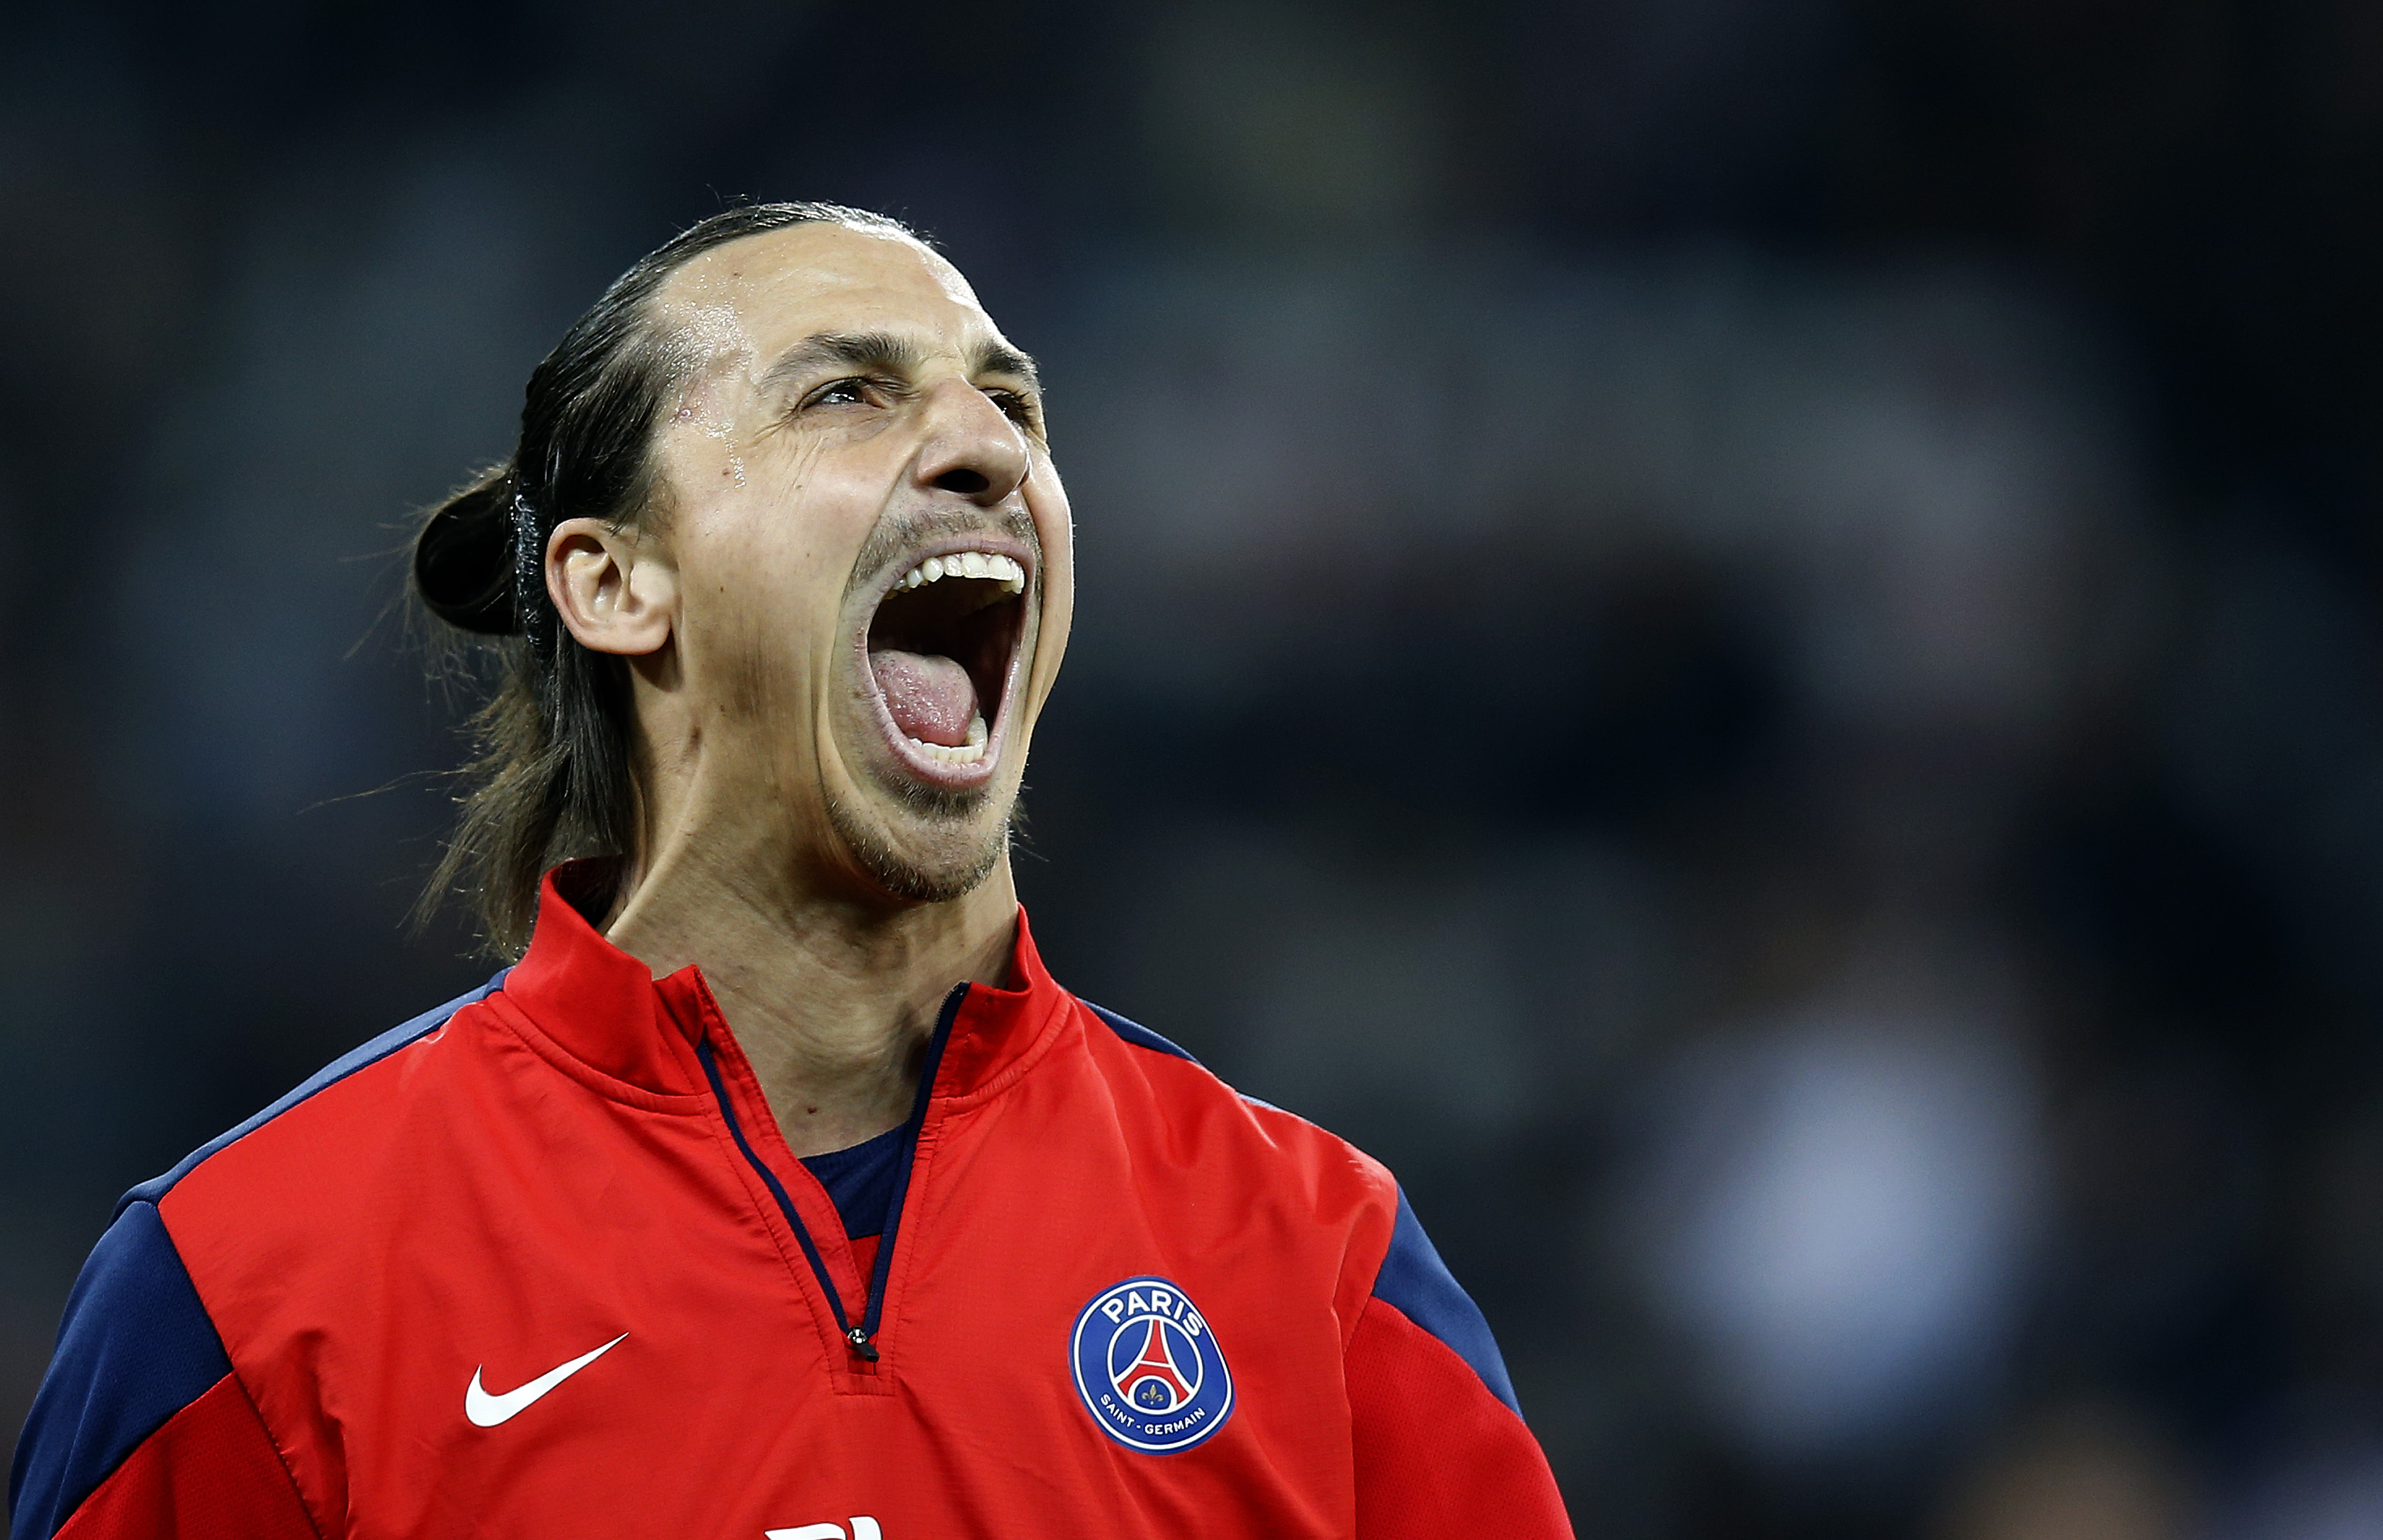 Zlatan Ibrahimovi se autoregala un lujoso vehículo eléctrico